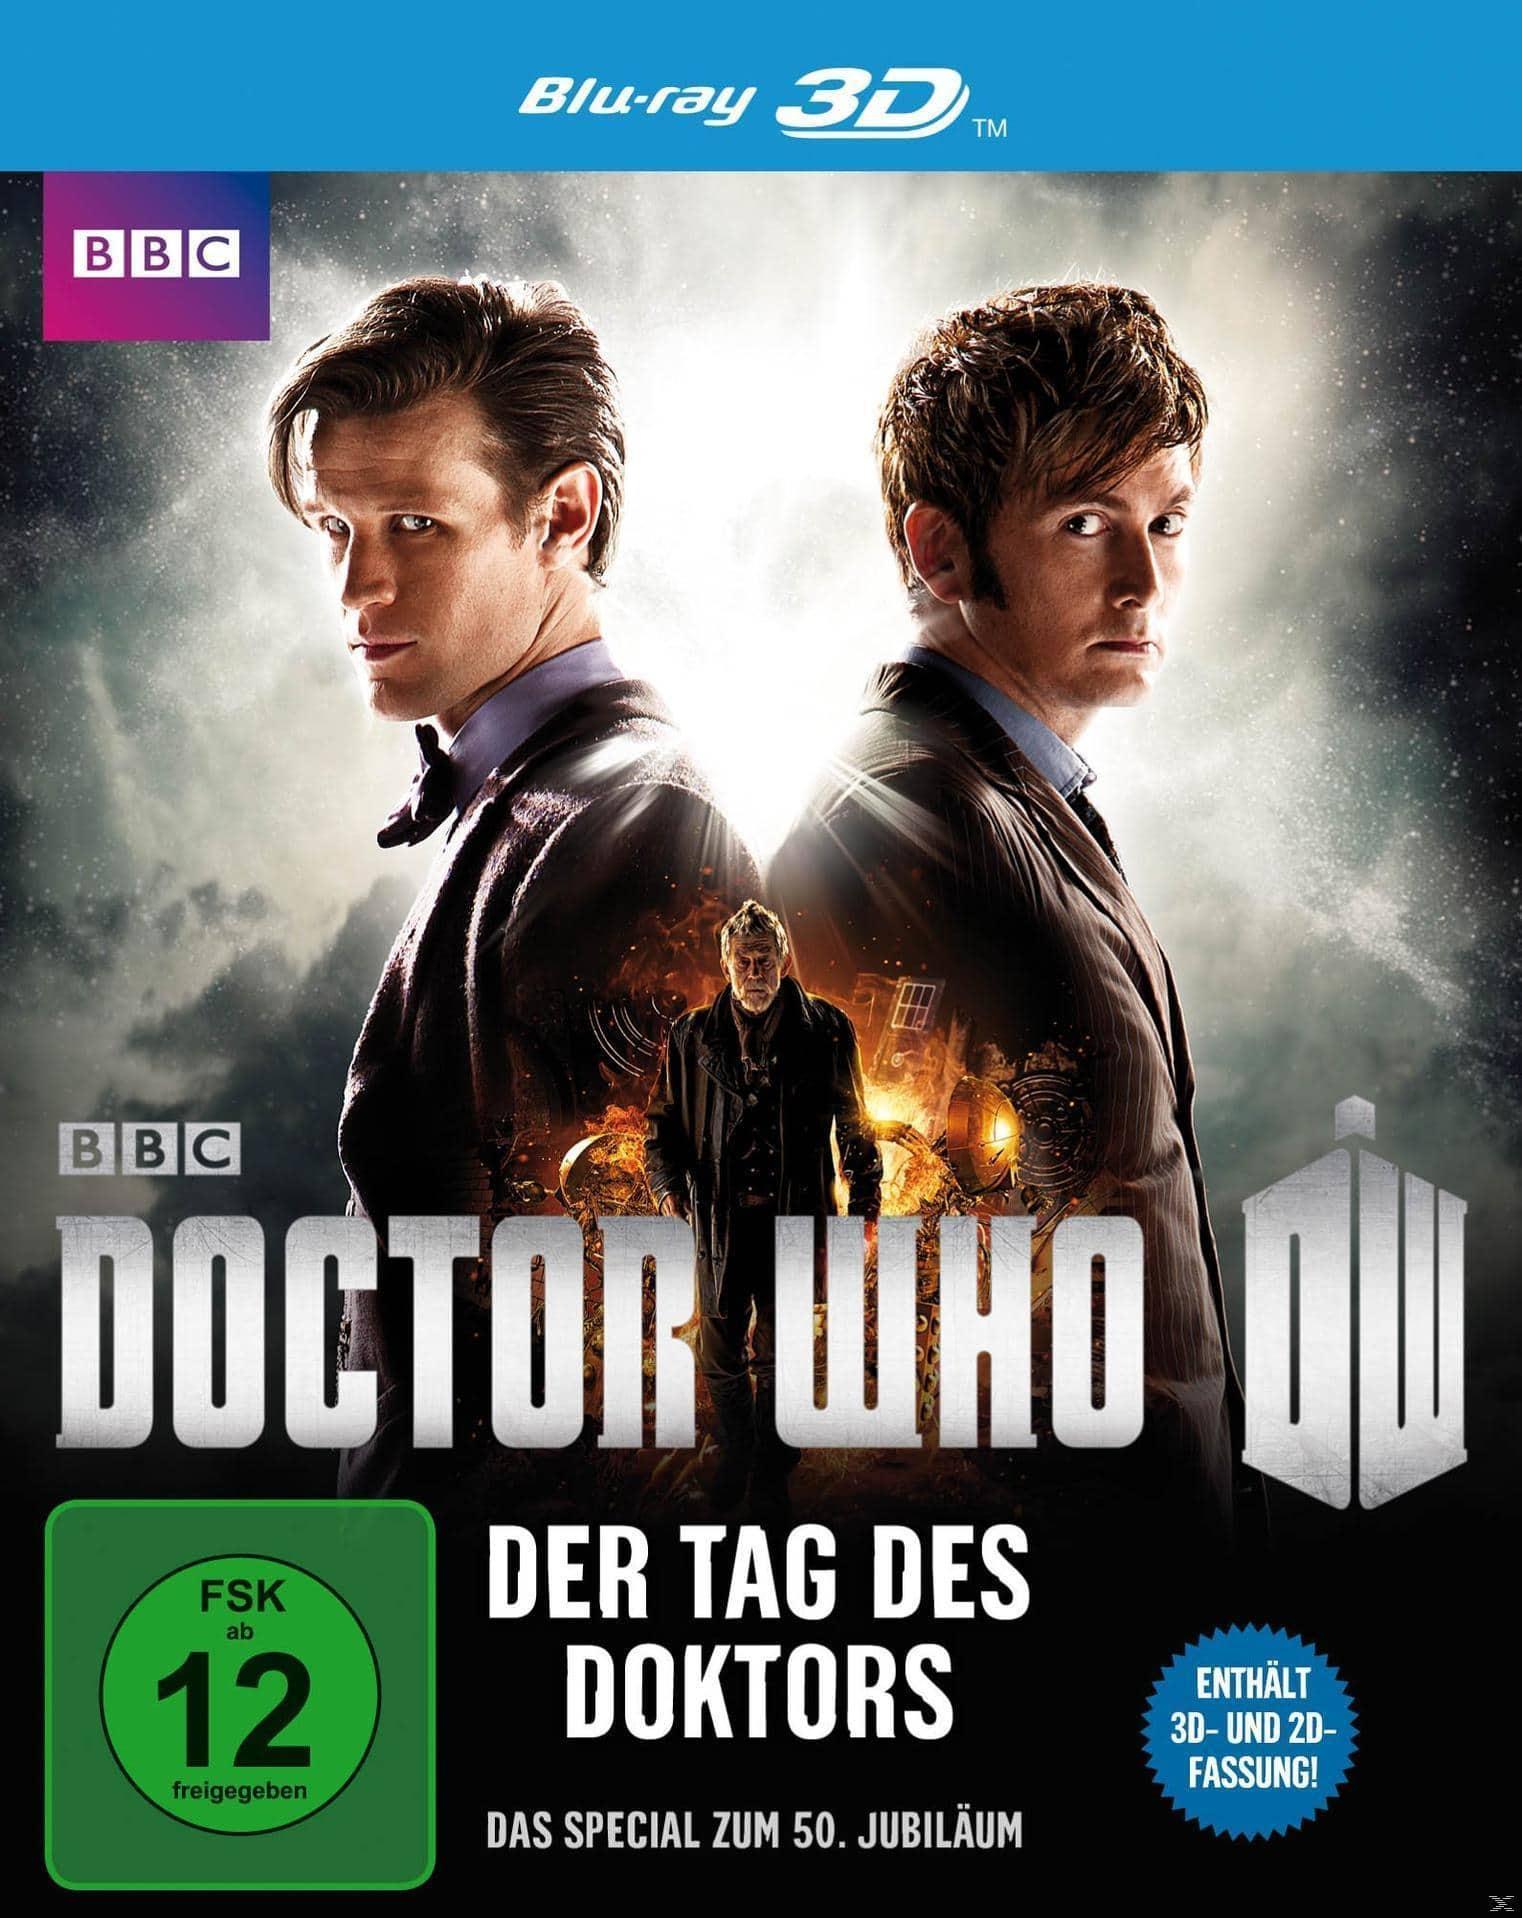 Doctor Who - Der Tag des Doktors 3D-Edition (BLU-RAY 3D) für 12,99 Euro